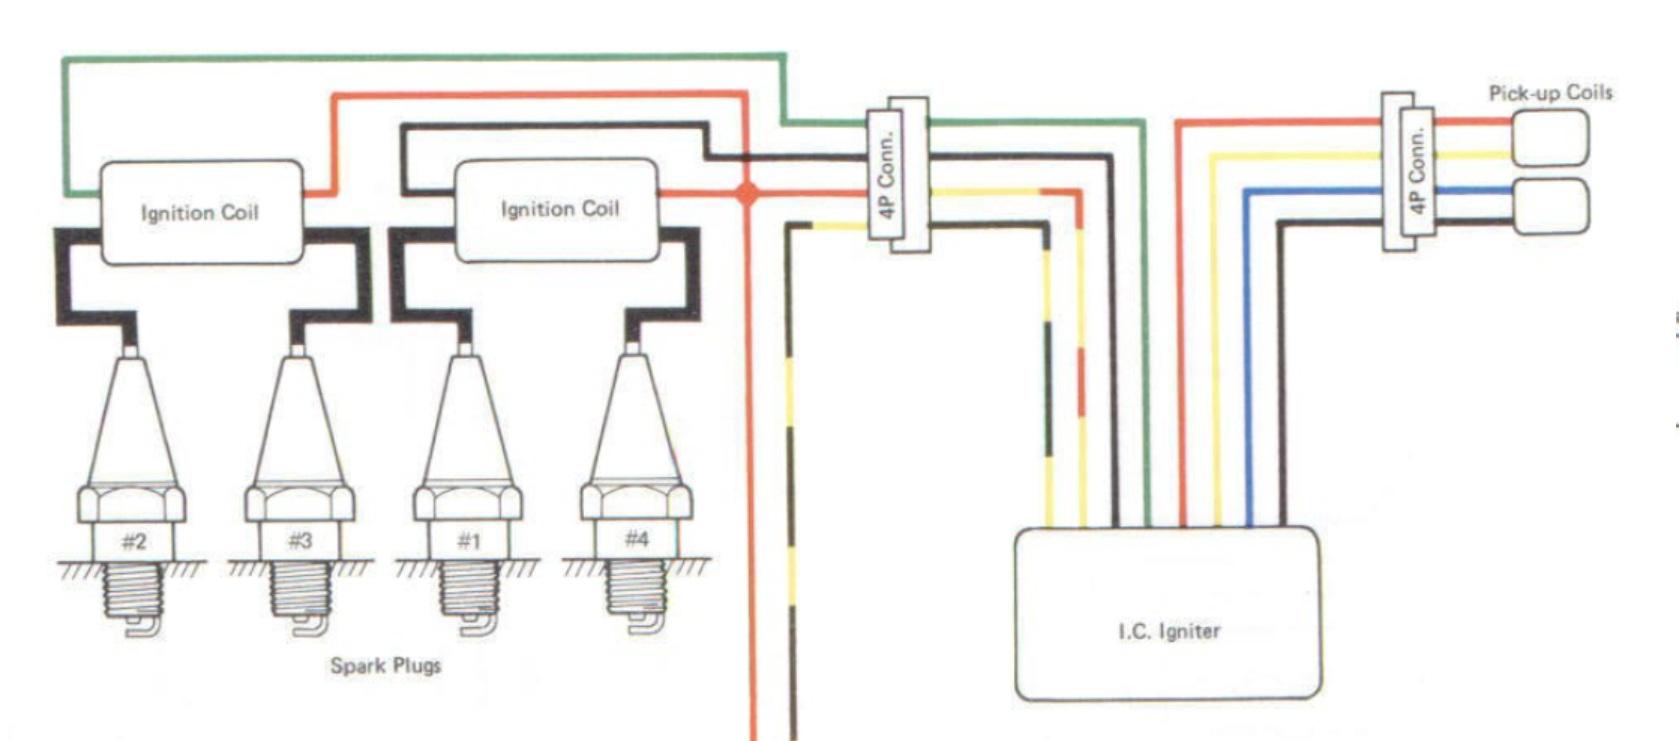 coilwiringKZ750e h1980 wiring dynatek diagram dd2000 ignition hd1e wiring library